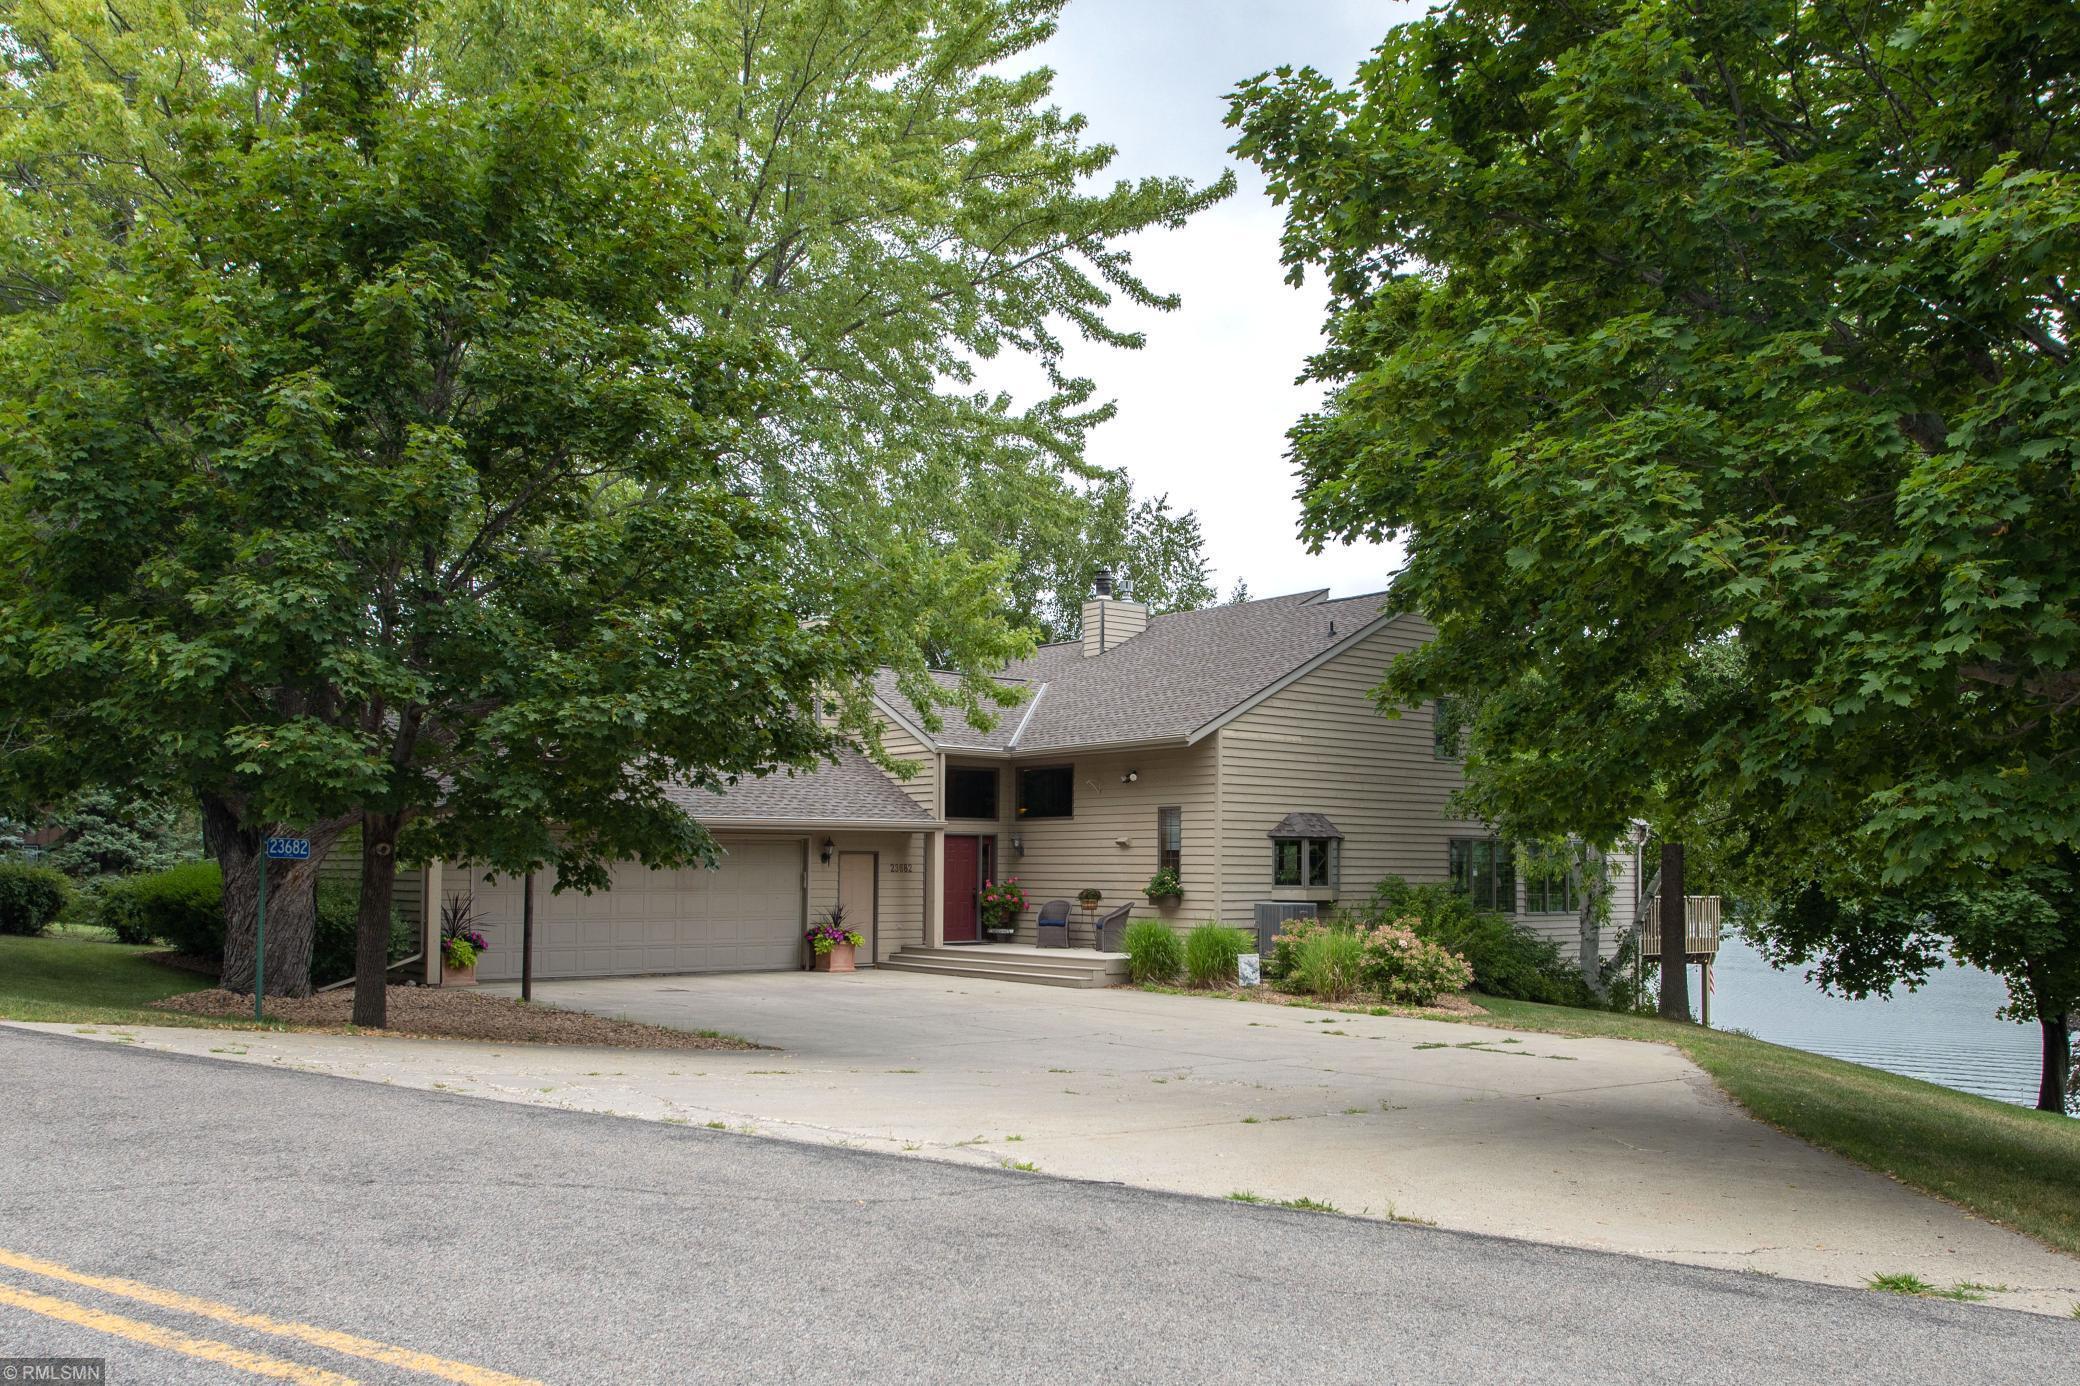 23682 727th Avenue Property Photo - Dassel, MN real estate listing